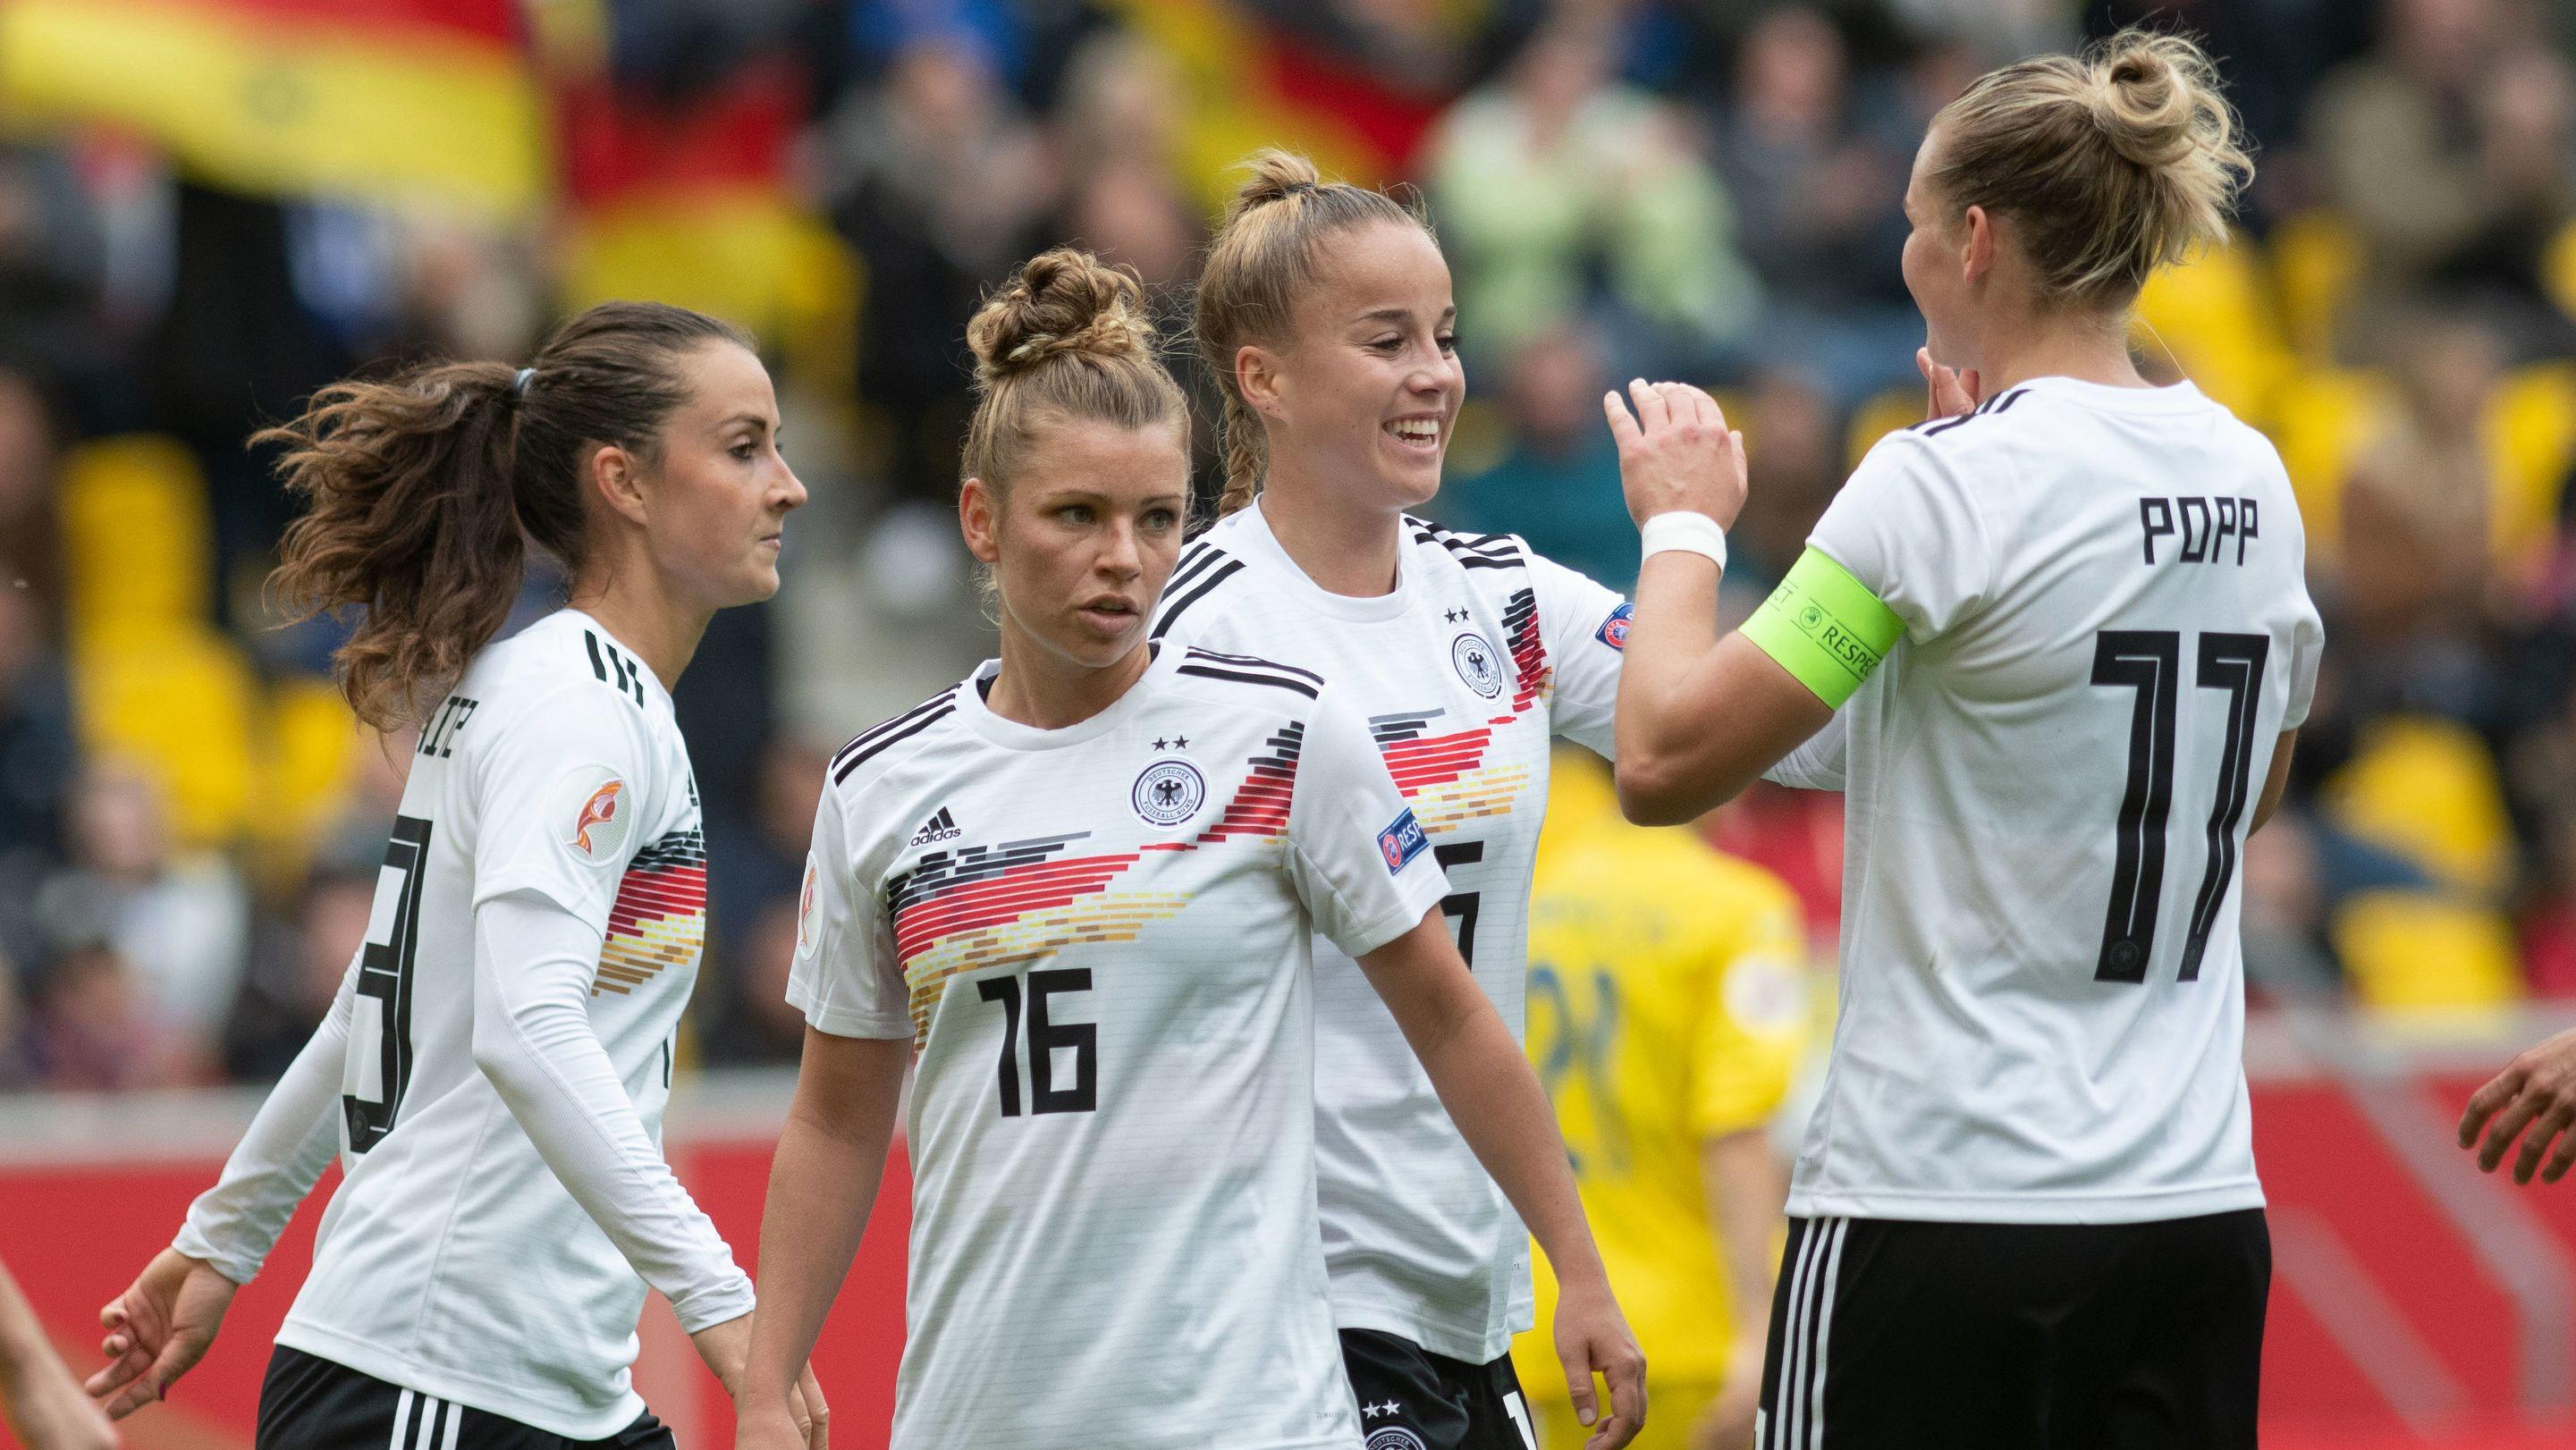 Jubel bei der Frauen-Nationalmannschaft